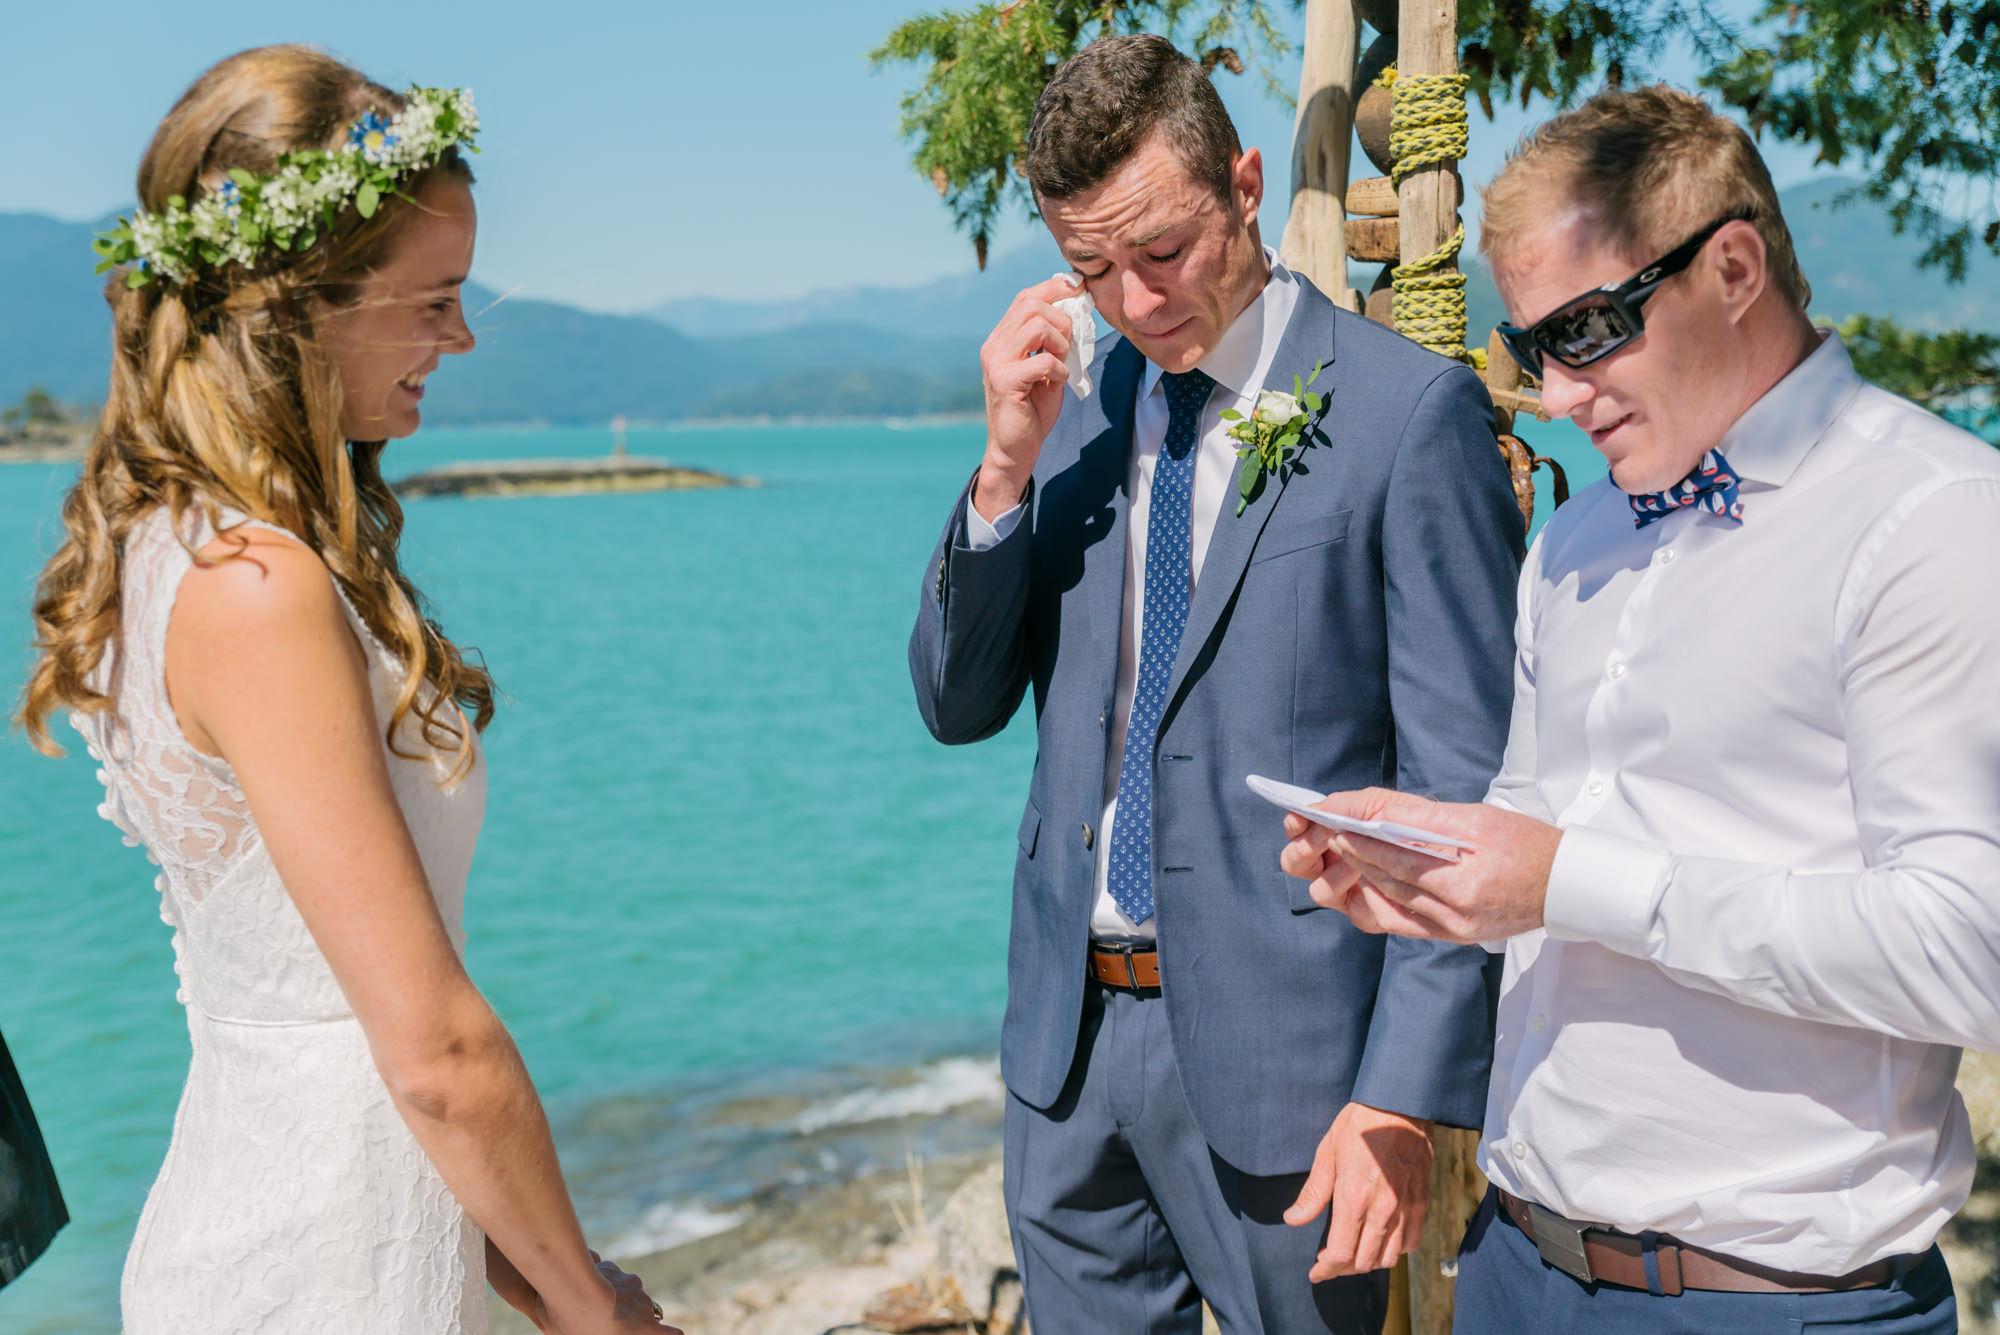 bowen_island_wedding_photographer_vancouver142417_14_ally&james.jpg